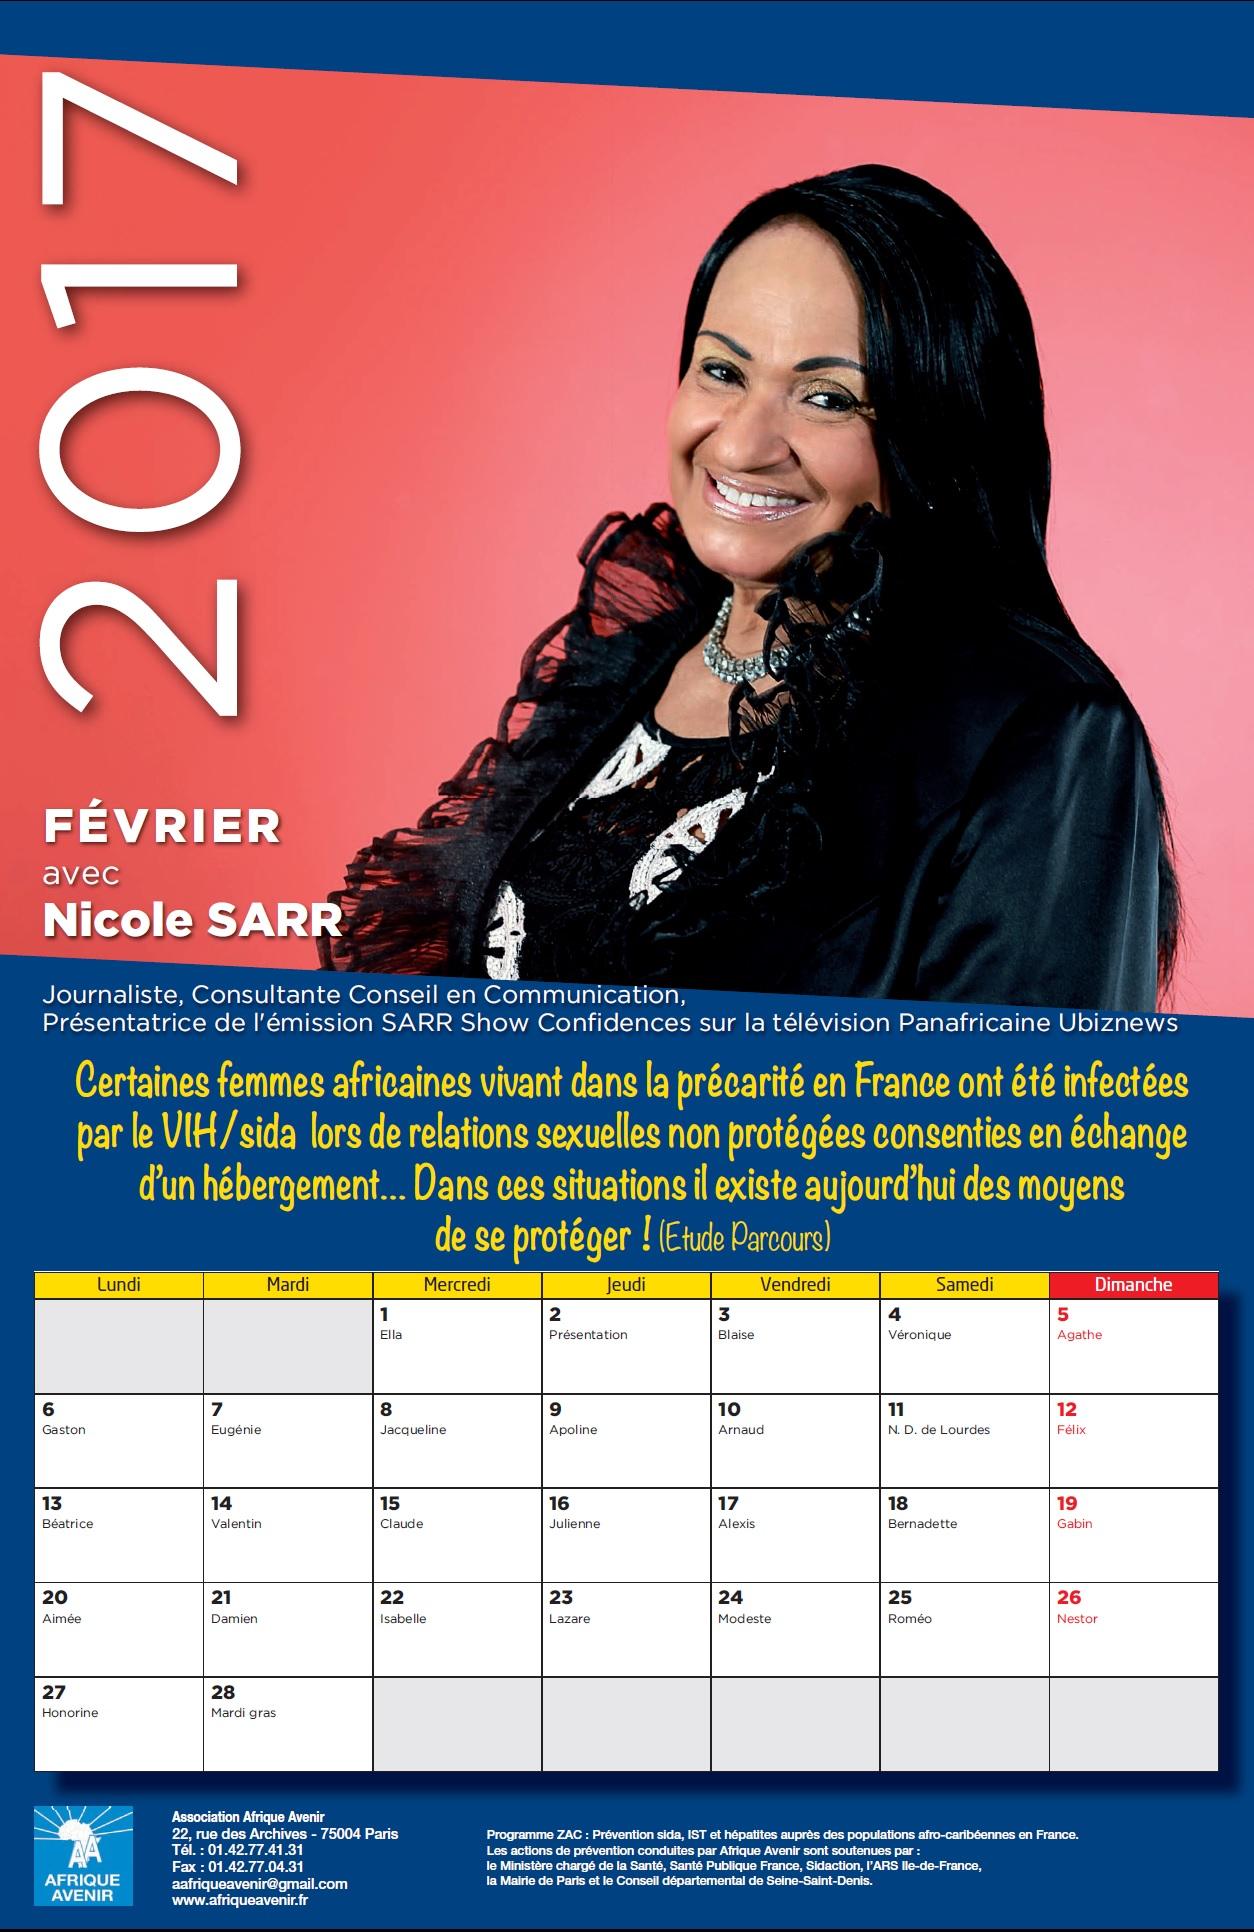 calendrier 2017: ETUDE PARCOURS, PREVENTION  DIVERSIFIEE